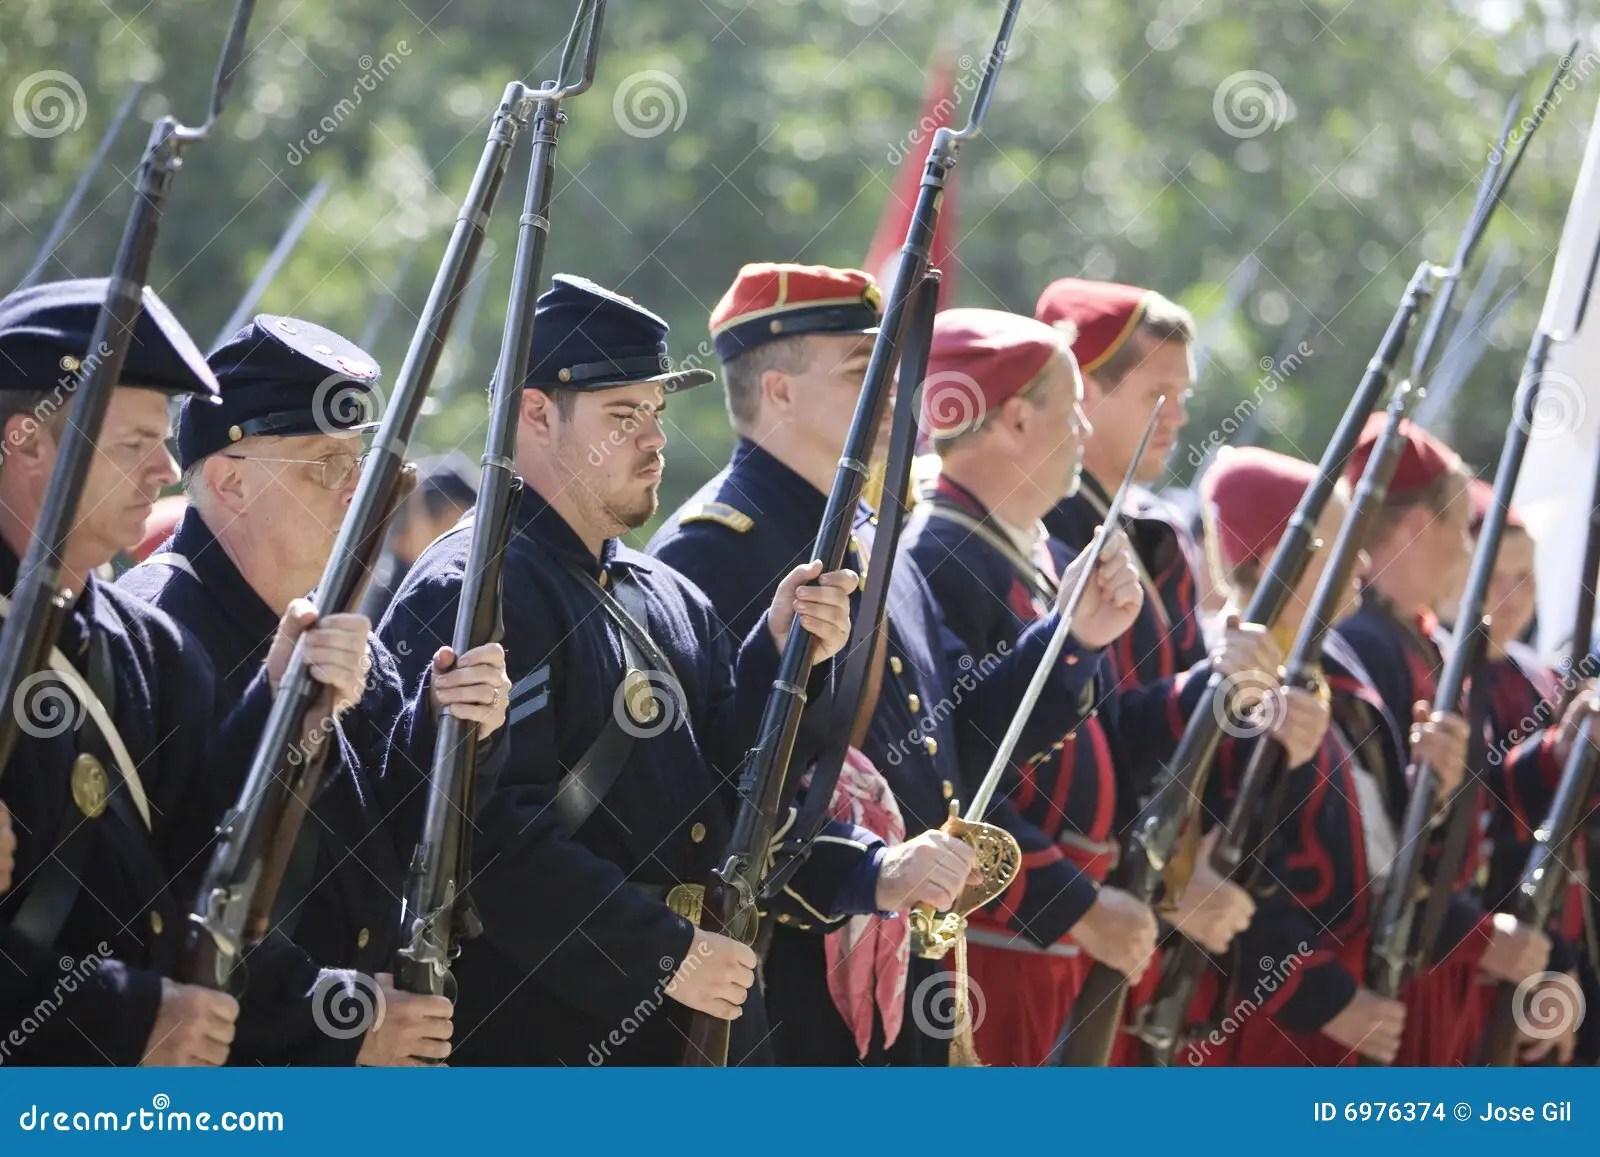 HB Civil War Re-Enactment 3363 Editorial Stock Image - Image of enactment. period: 6976374